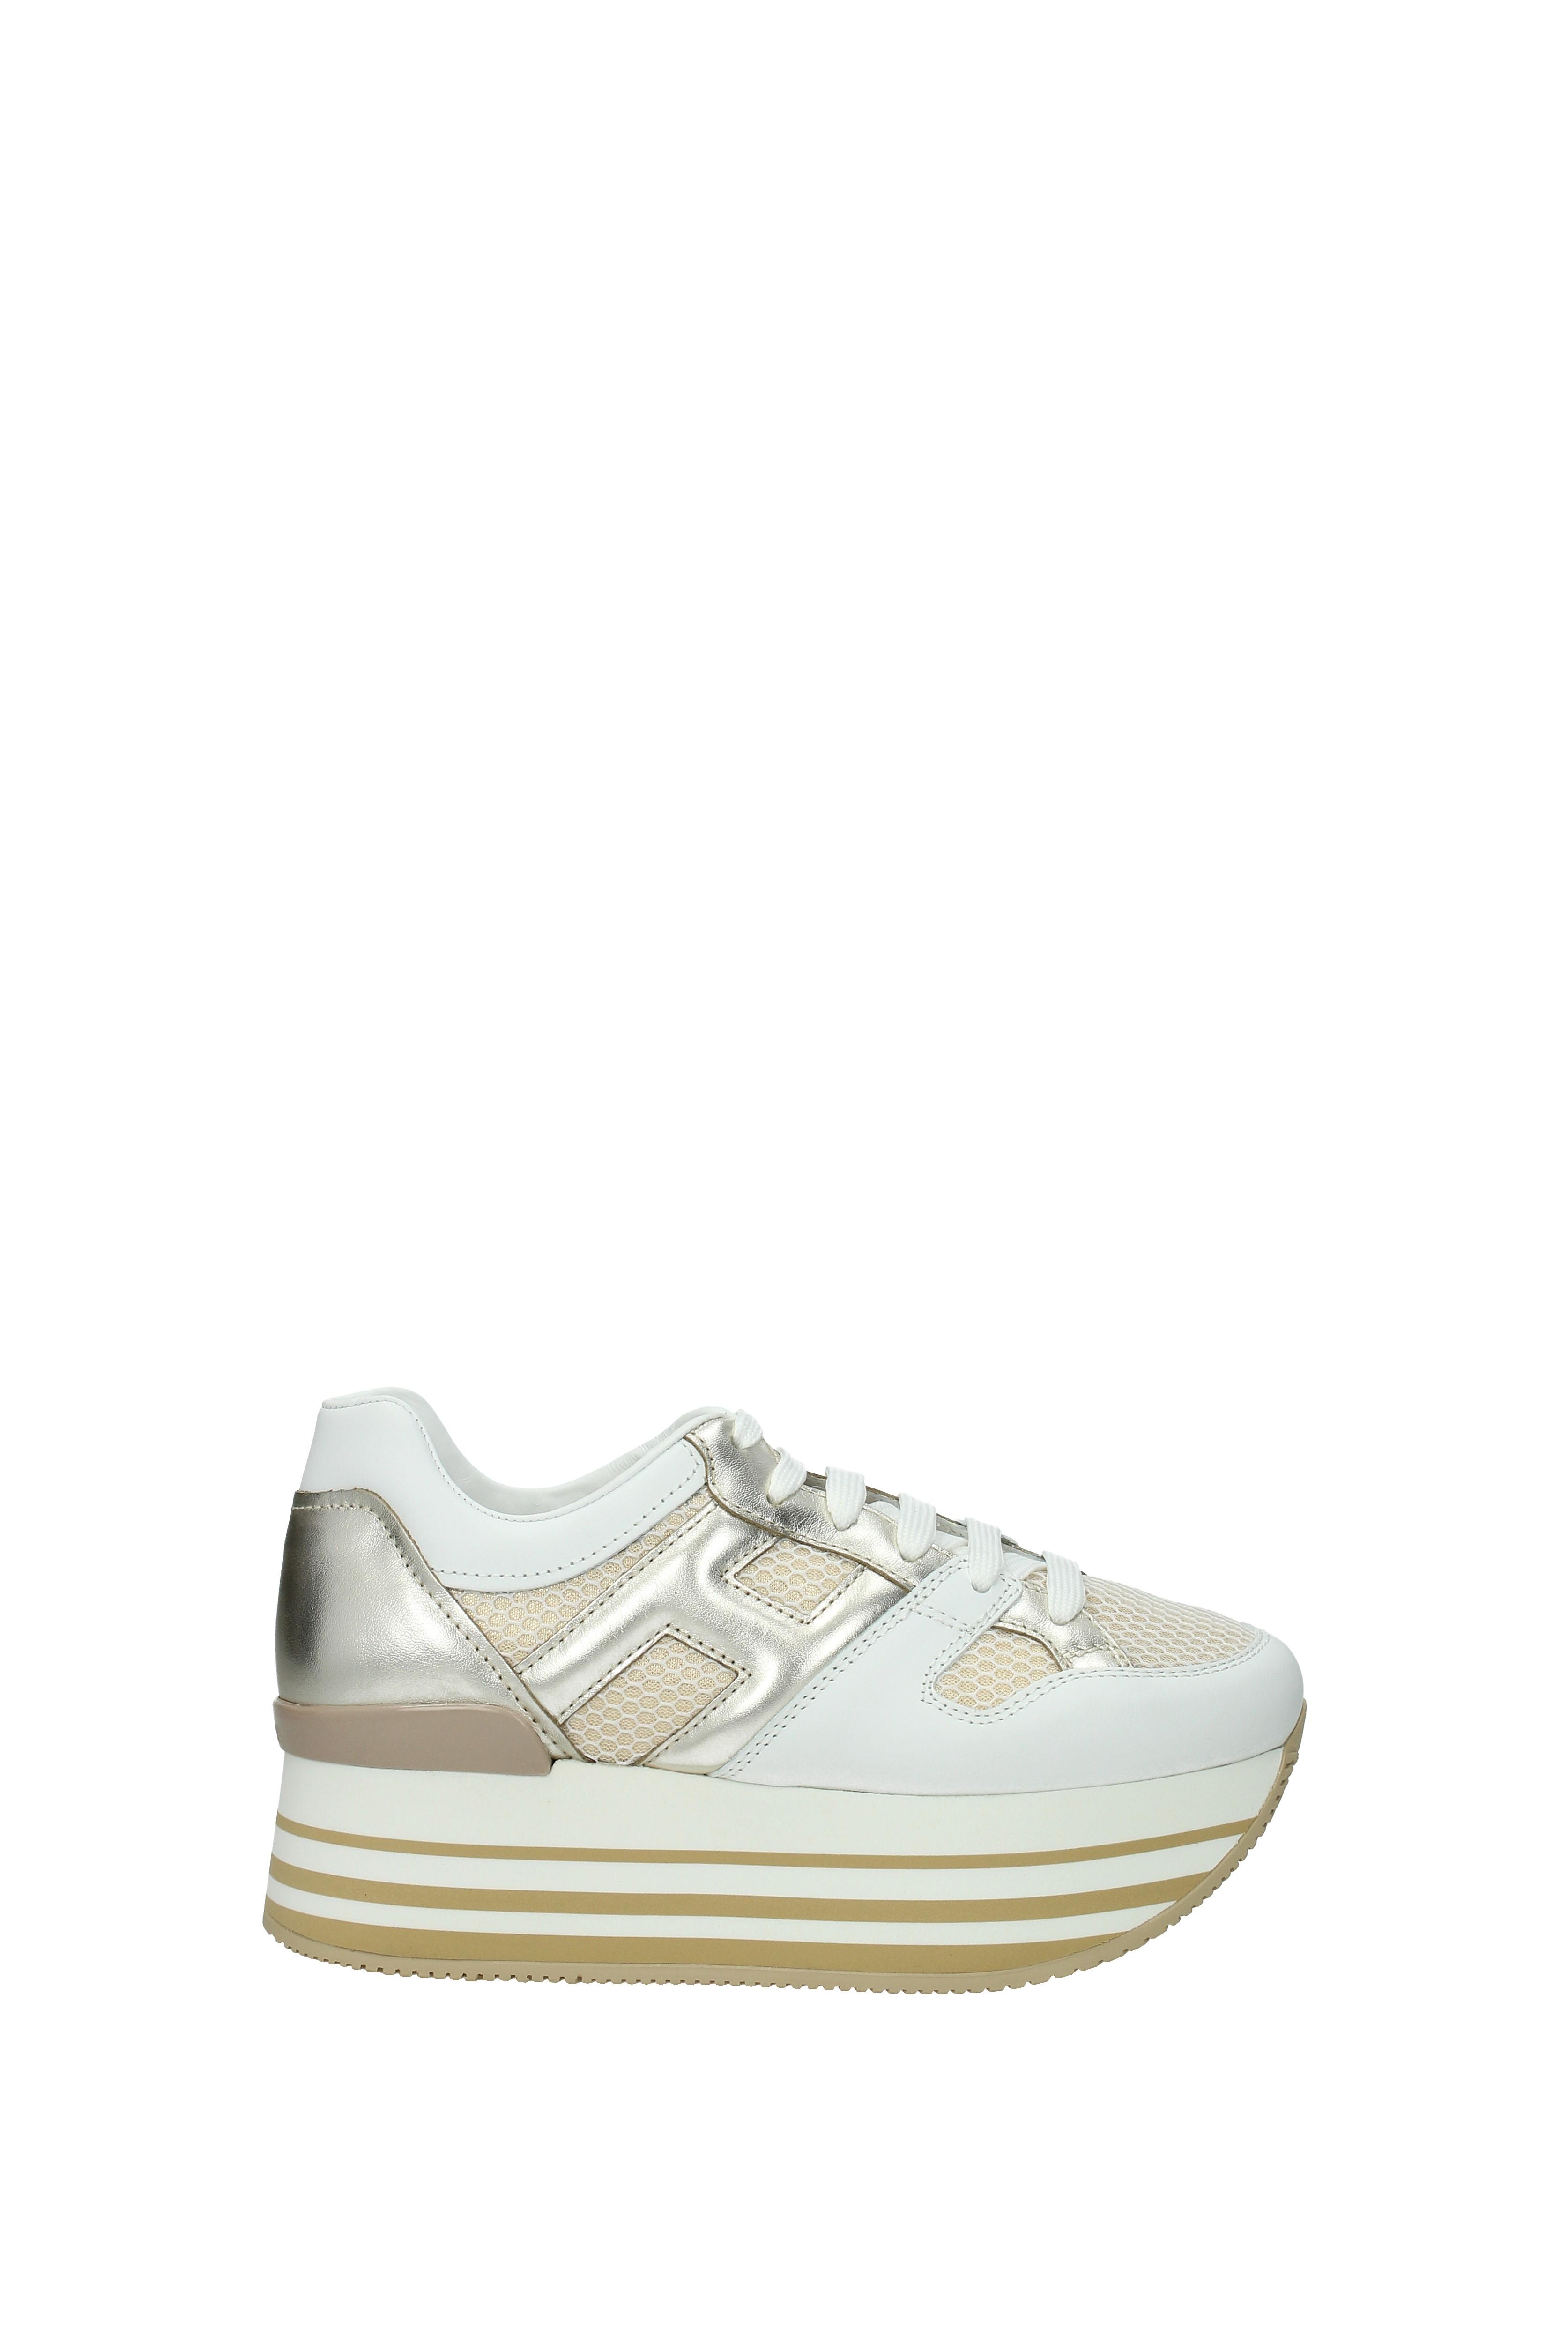 Alta qualit Sneakers Hogan Donna Pelle HXW2830U352IGA vendita -  mainstreetblytheville.org 0af4af1f5b4